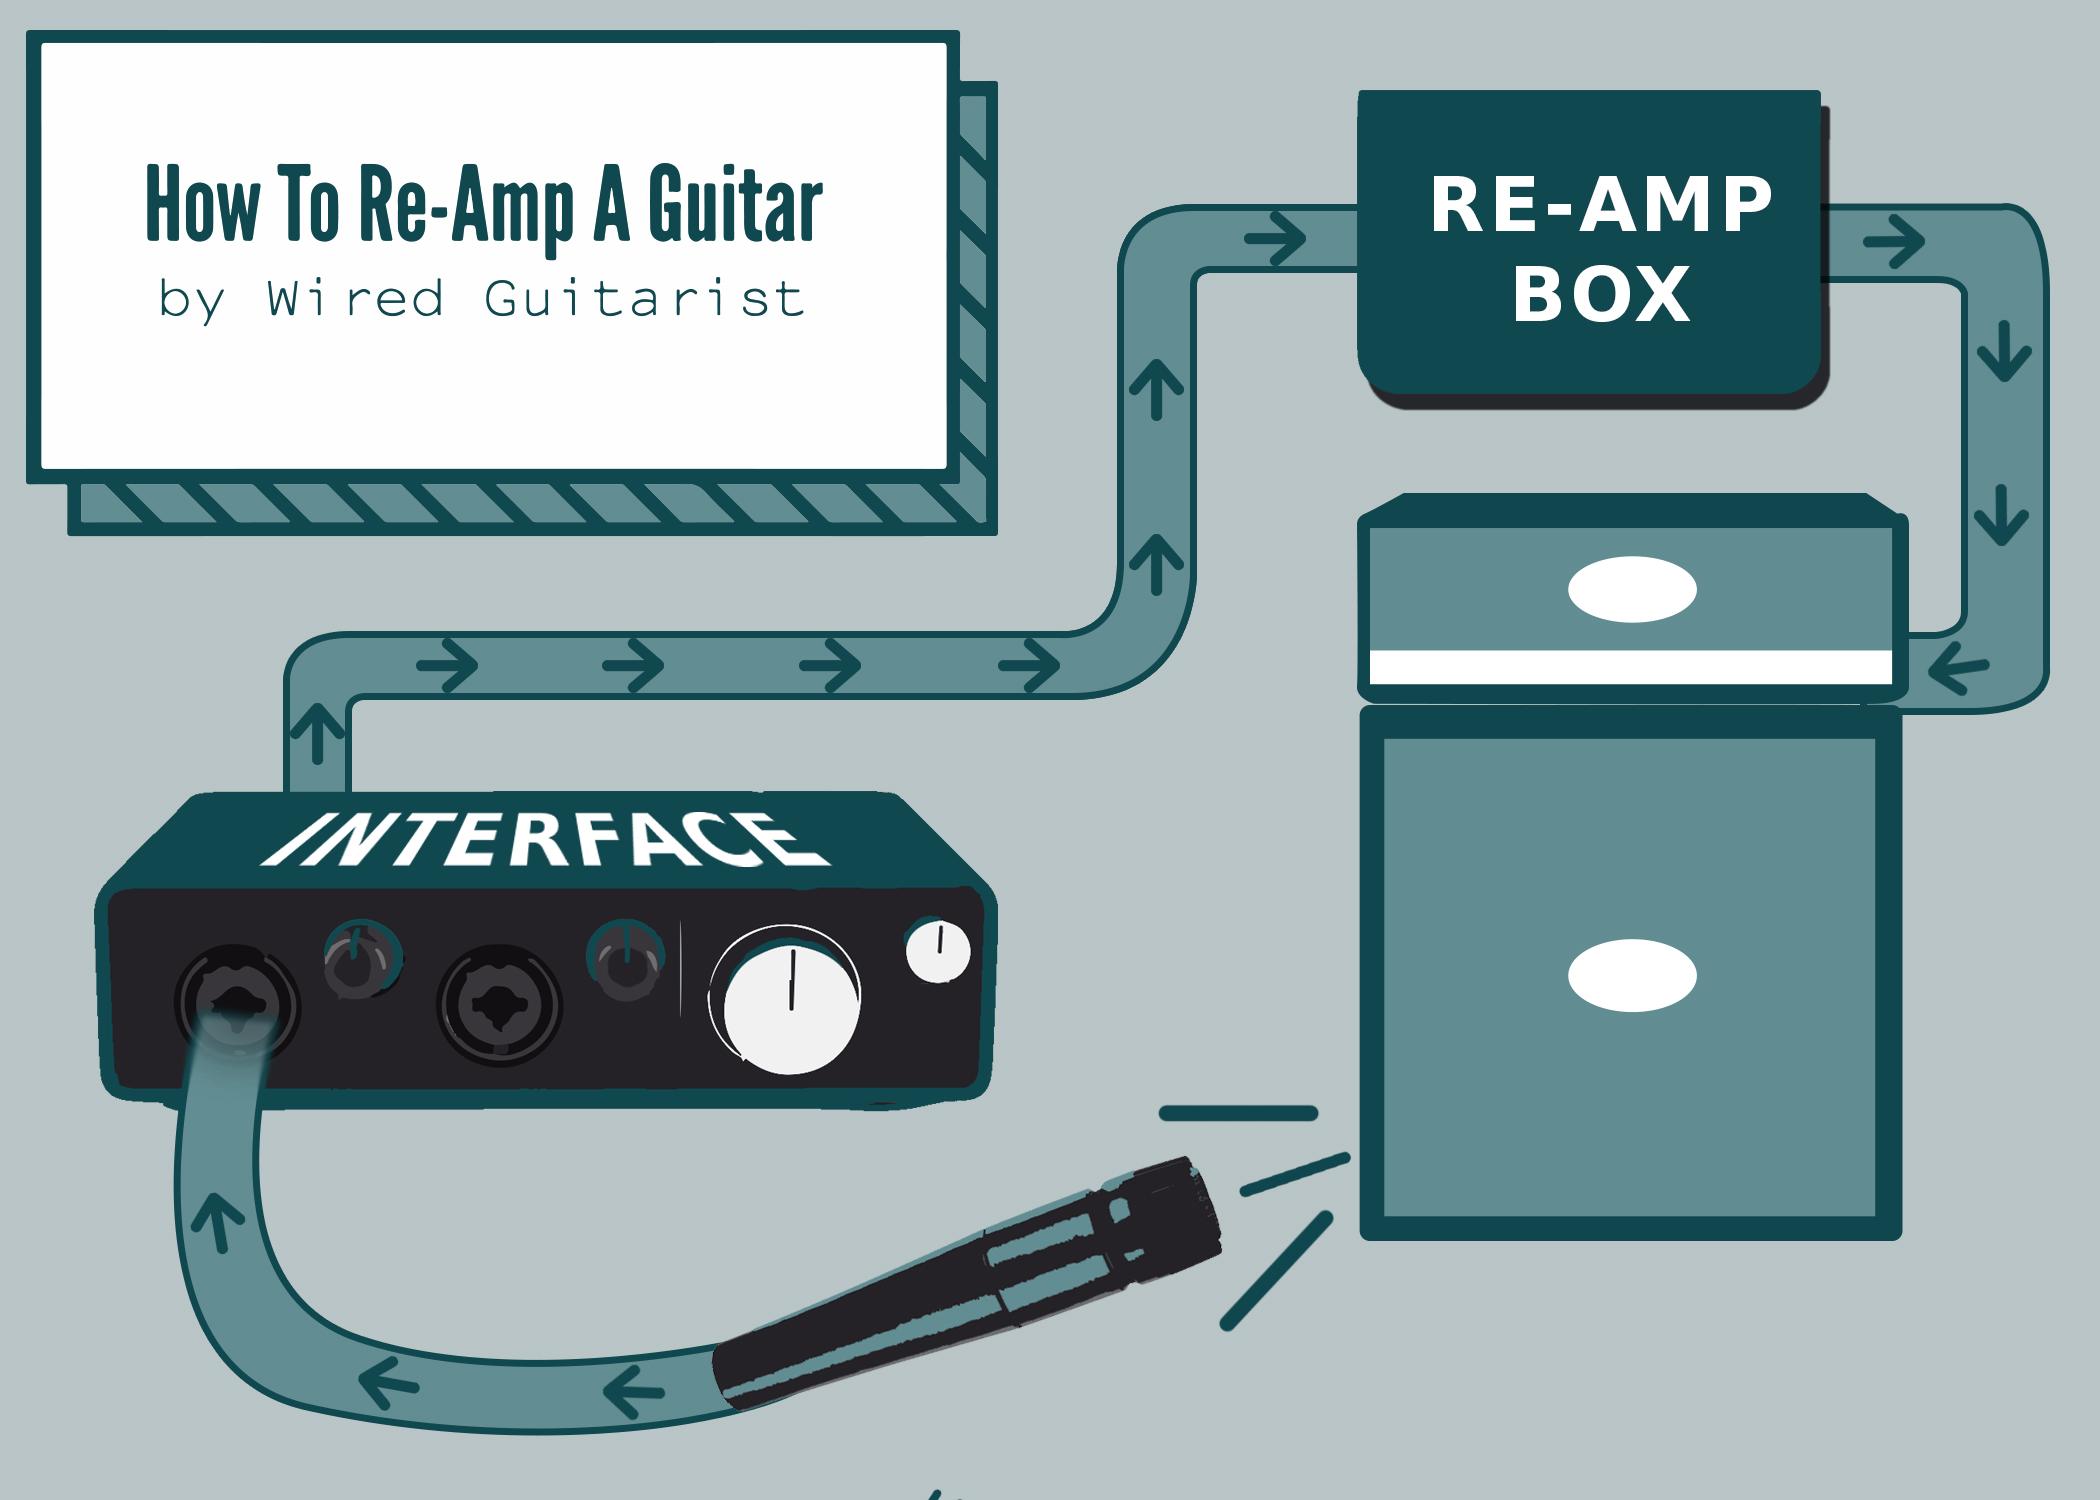 Re-amp Infographic